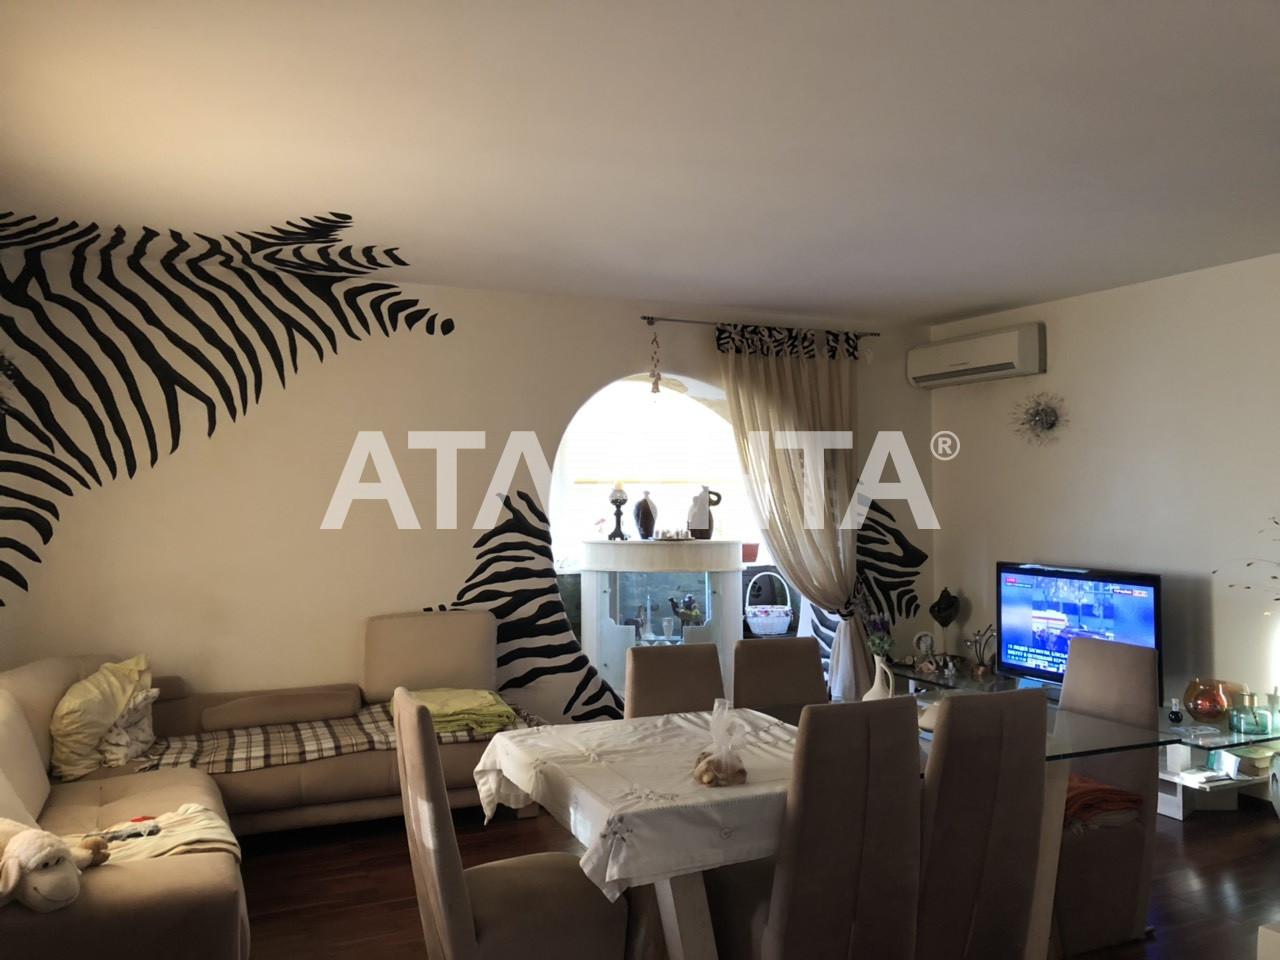 Продается 3-комнатная Квартира на ул. 1 Мая — 135 000 у.е. (фото №2)